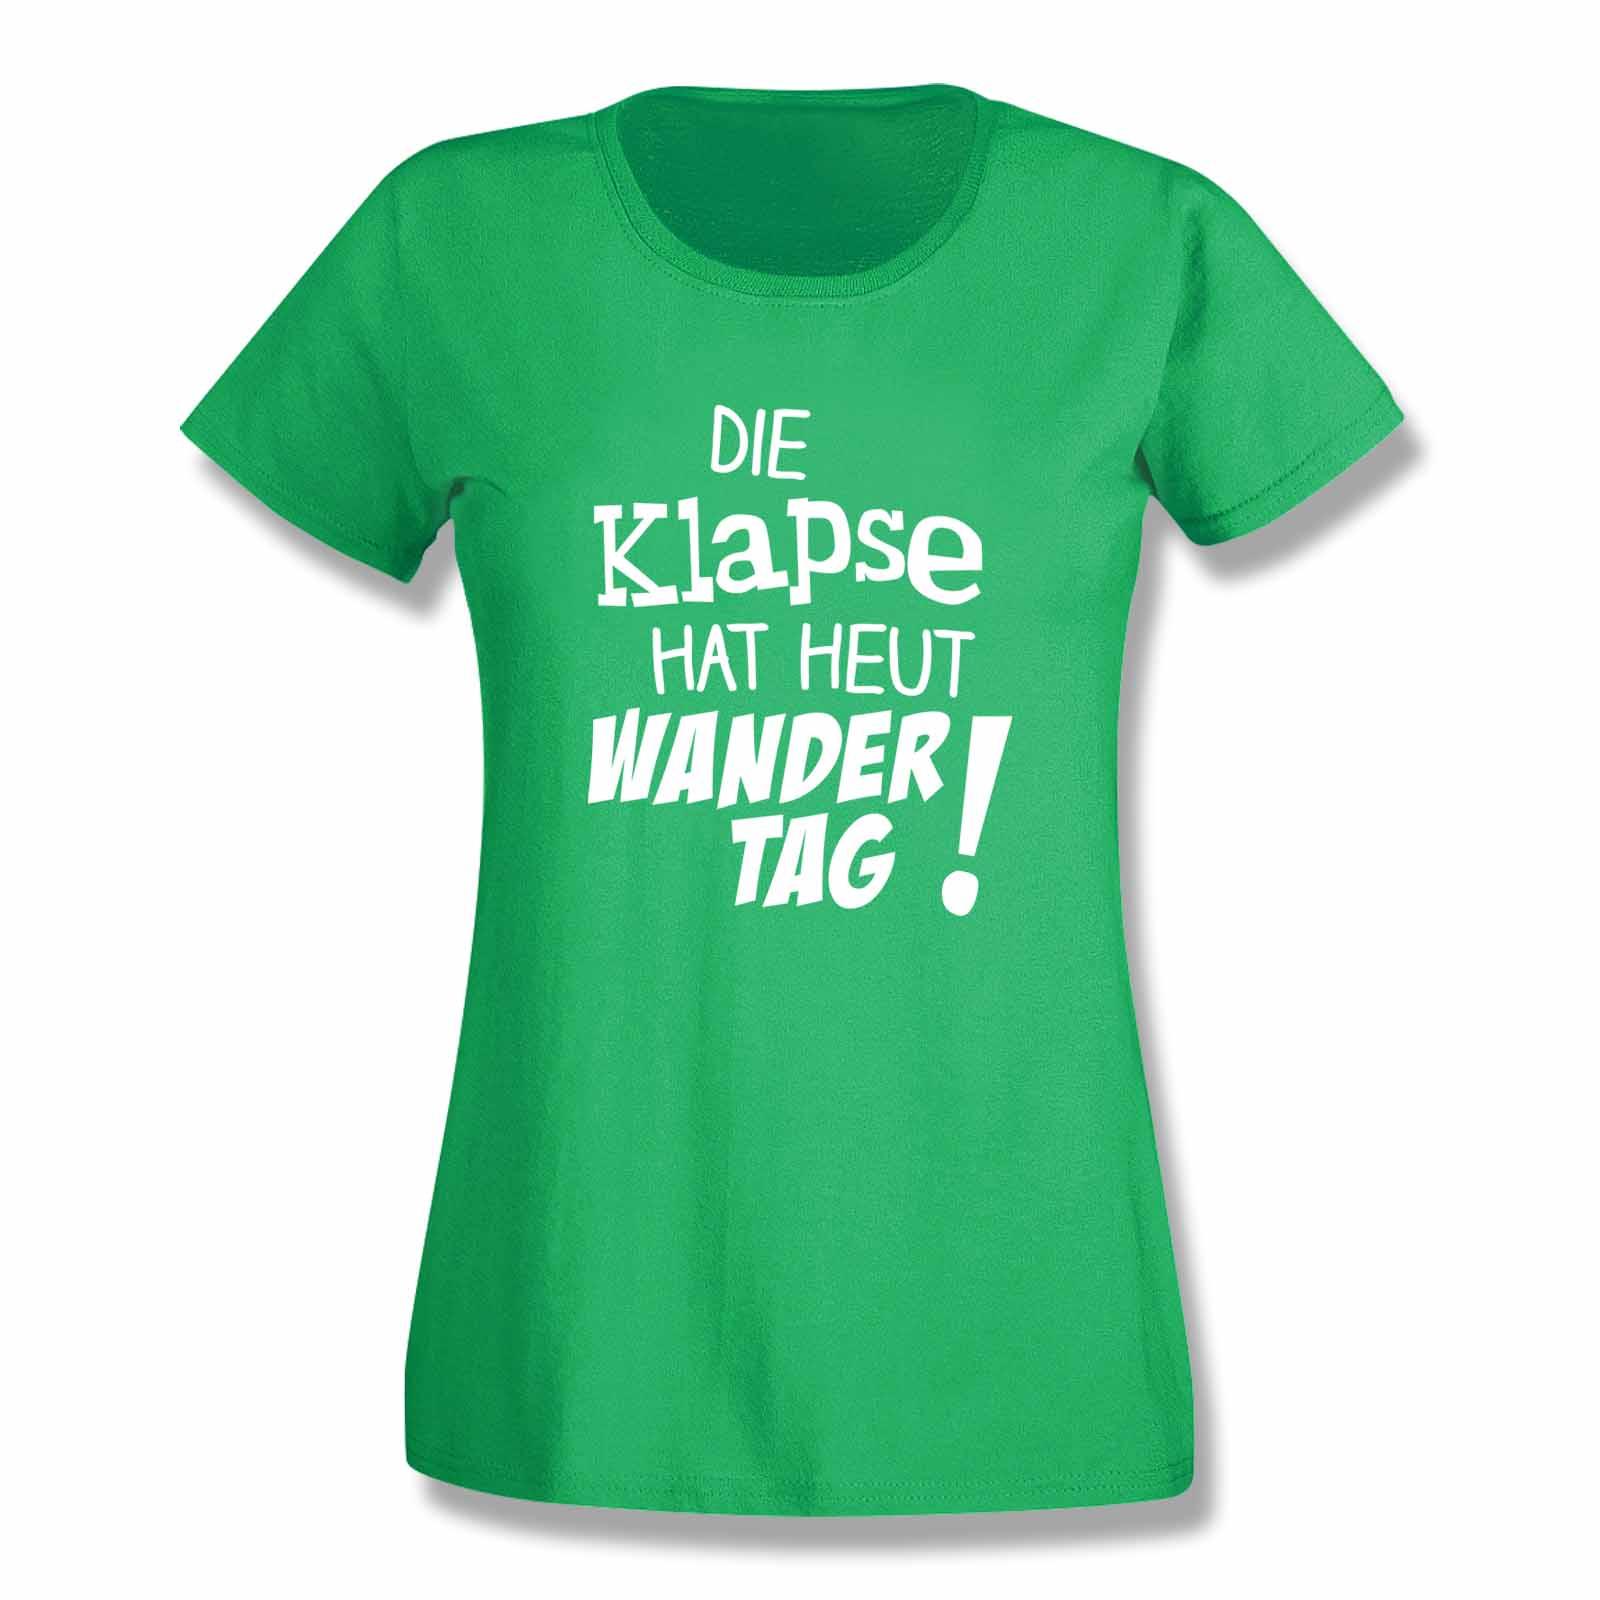 Full Size of Handwerker Sprüche T Shirt Walter Röhrl Sprüche T Shirt Sprüche T Shirt Urheberrecht Landwirt Sprüche T Shirt Küche Sprüche T Shirt